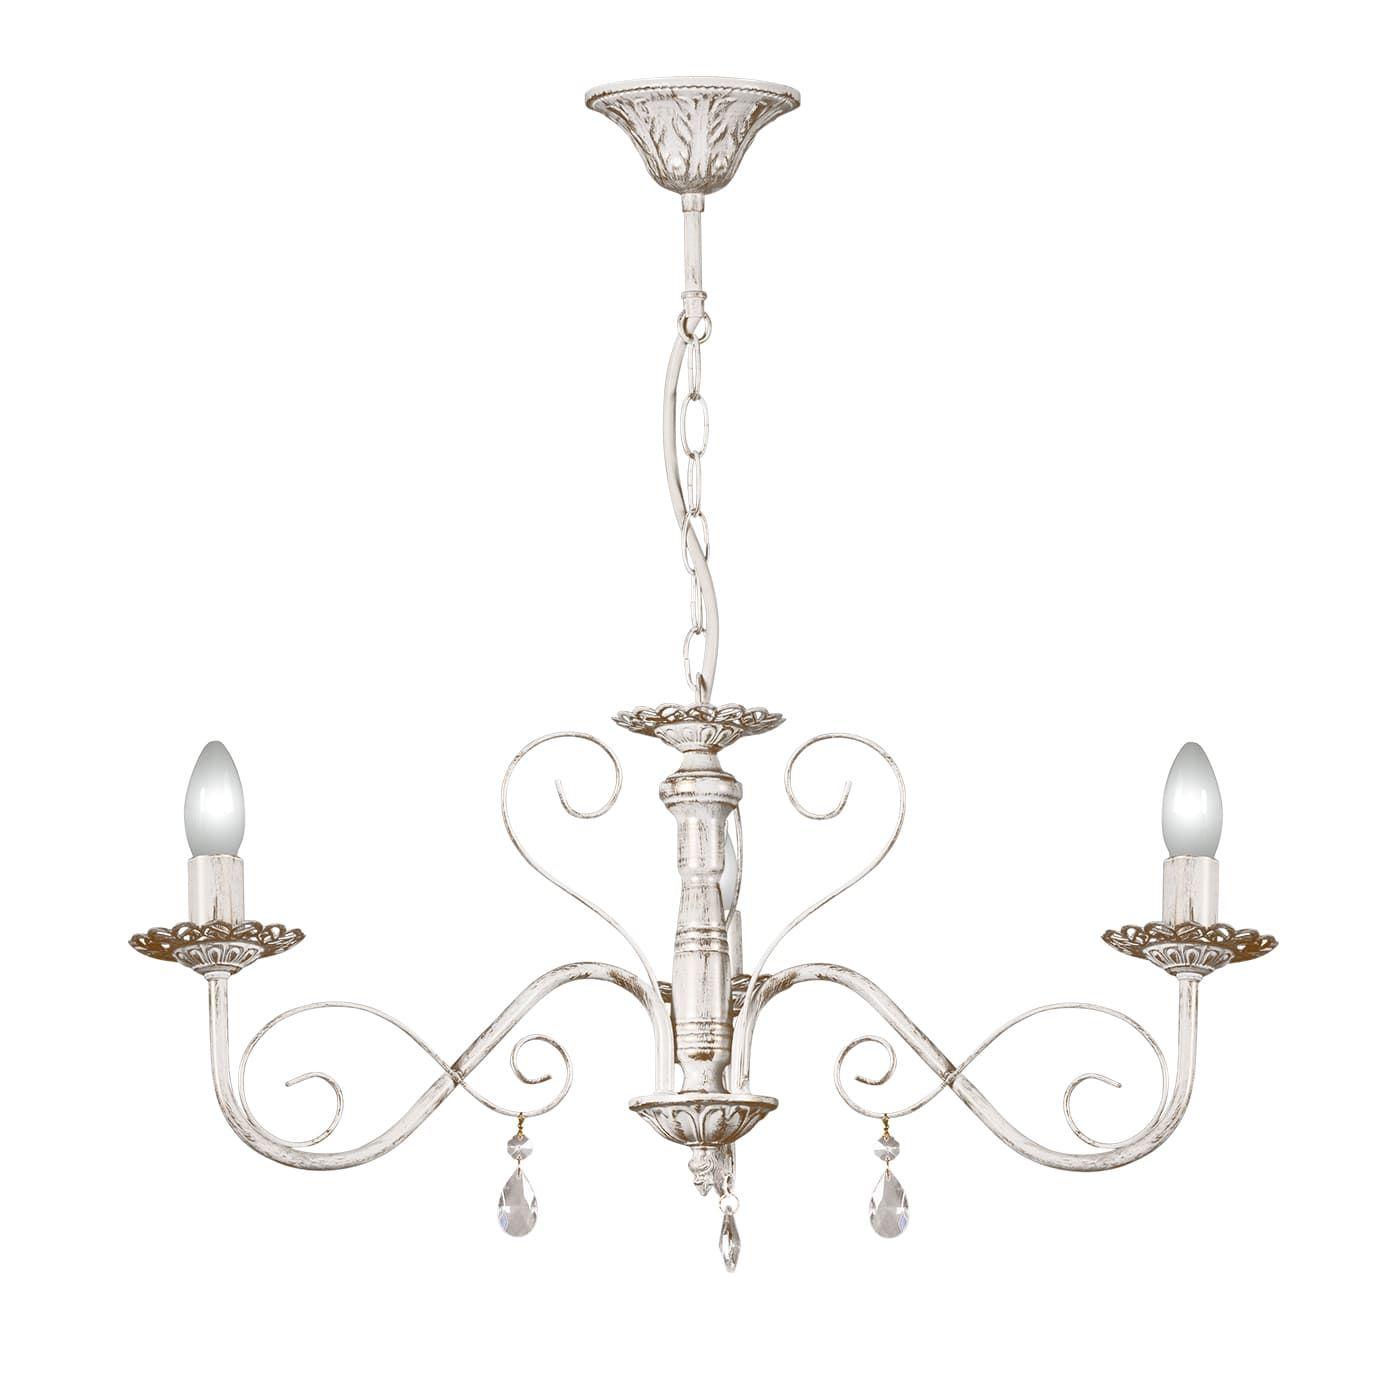 PETRASVET / Pendant chandelier S1023-3, 3xE14 max. 60W